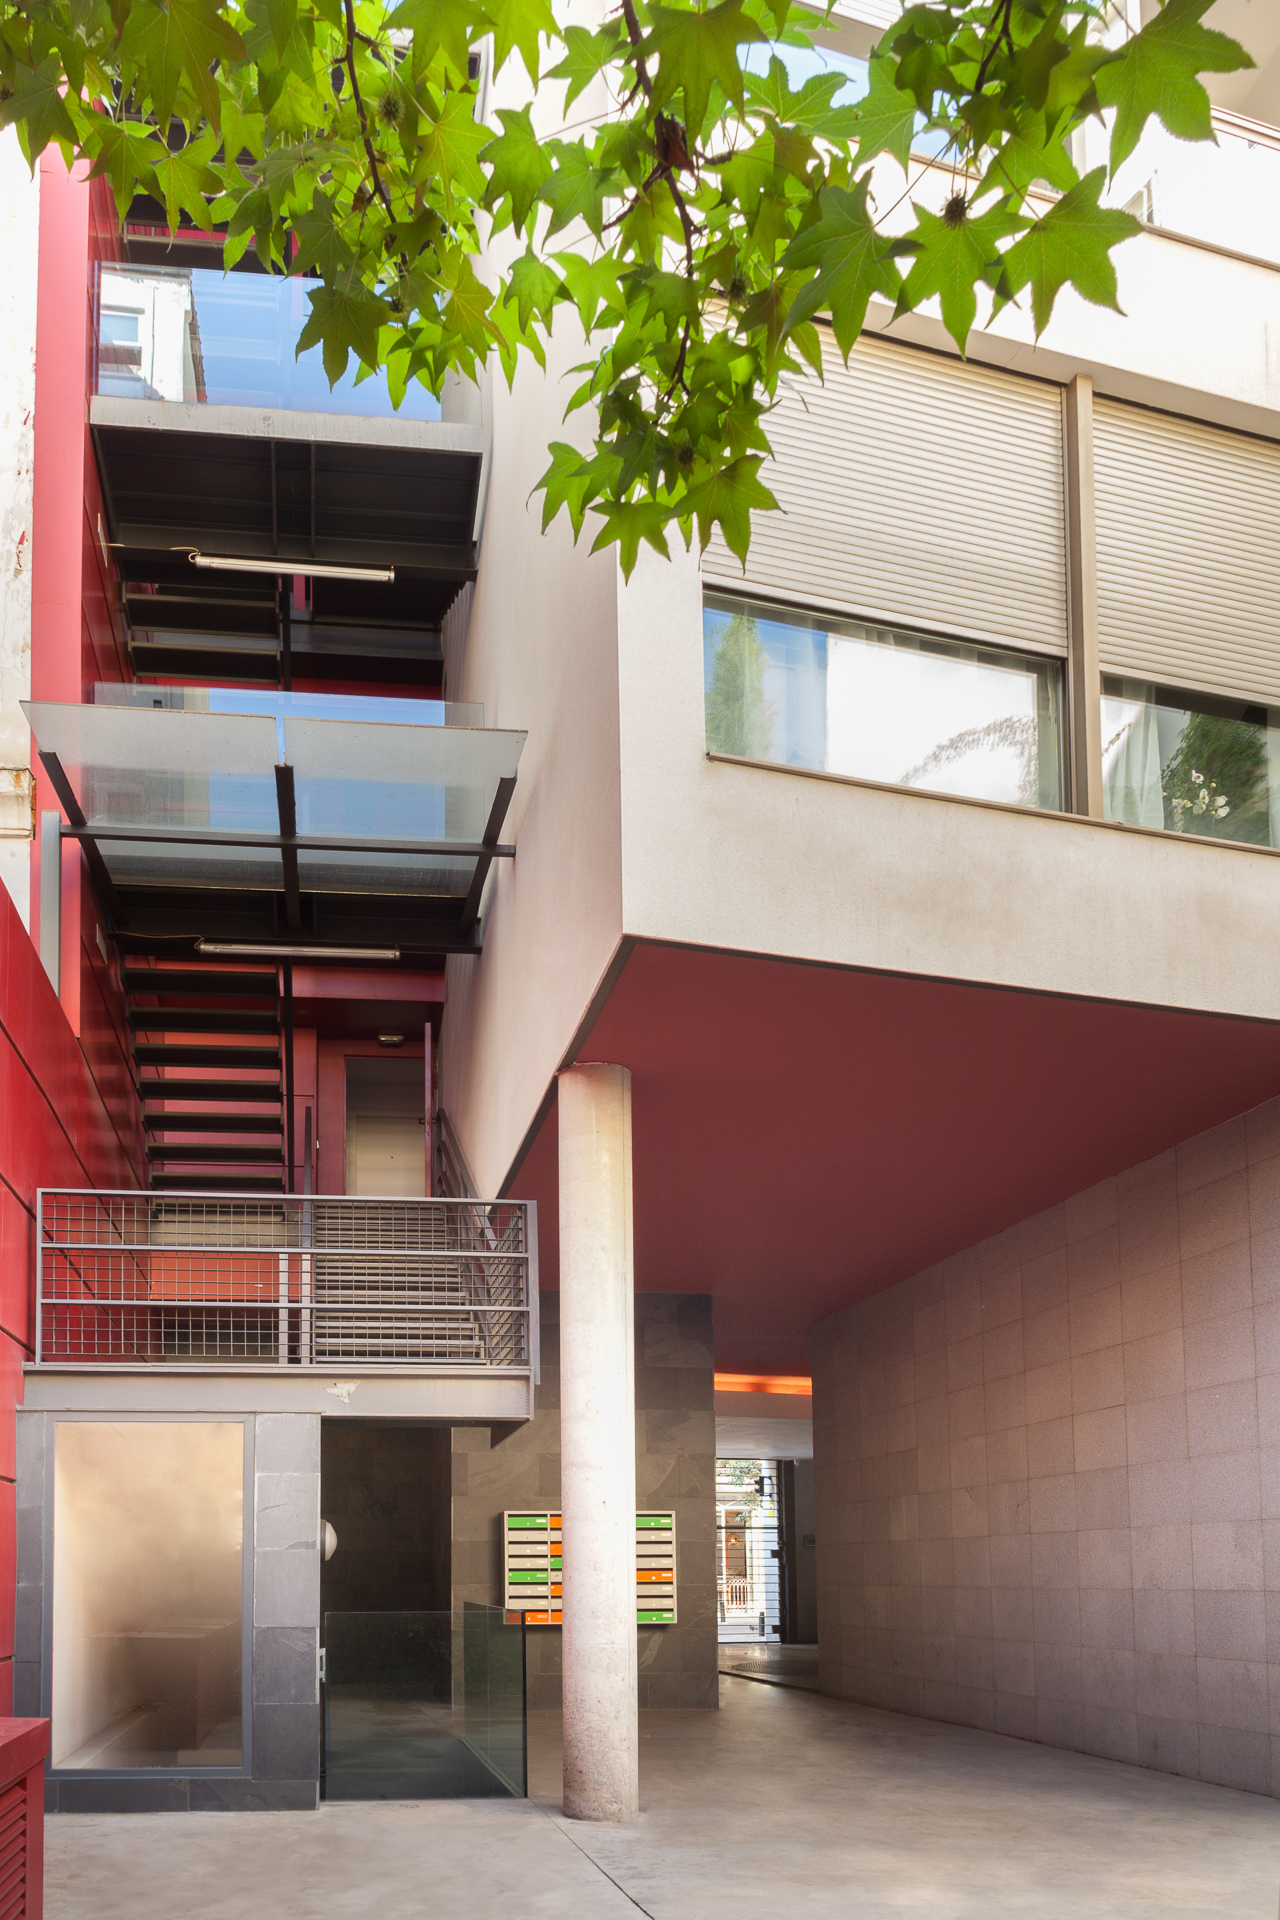 TRIBUNAL_Maroto_Ibañez_arquitectos01